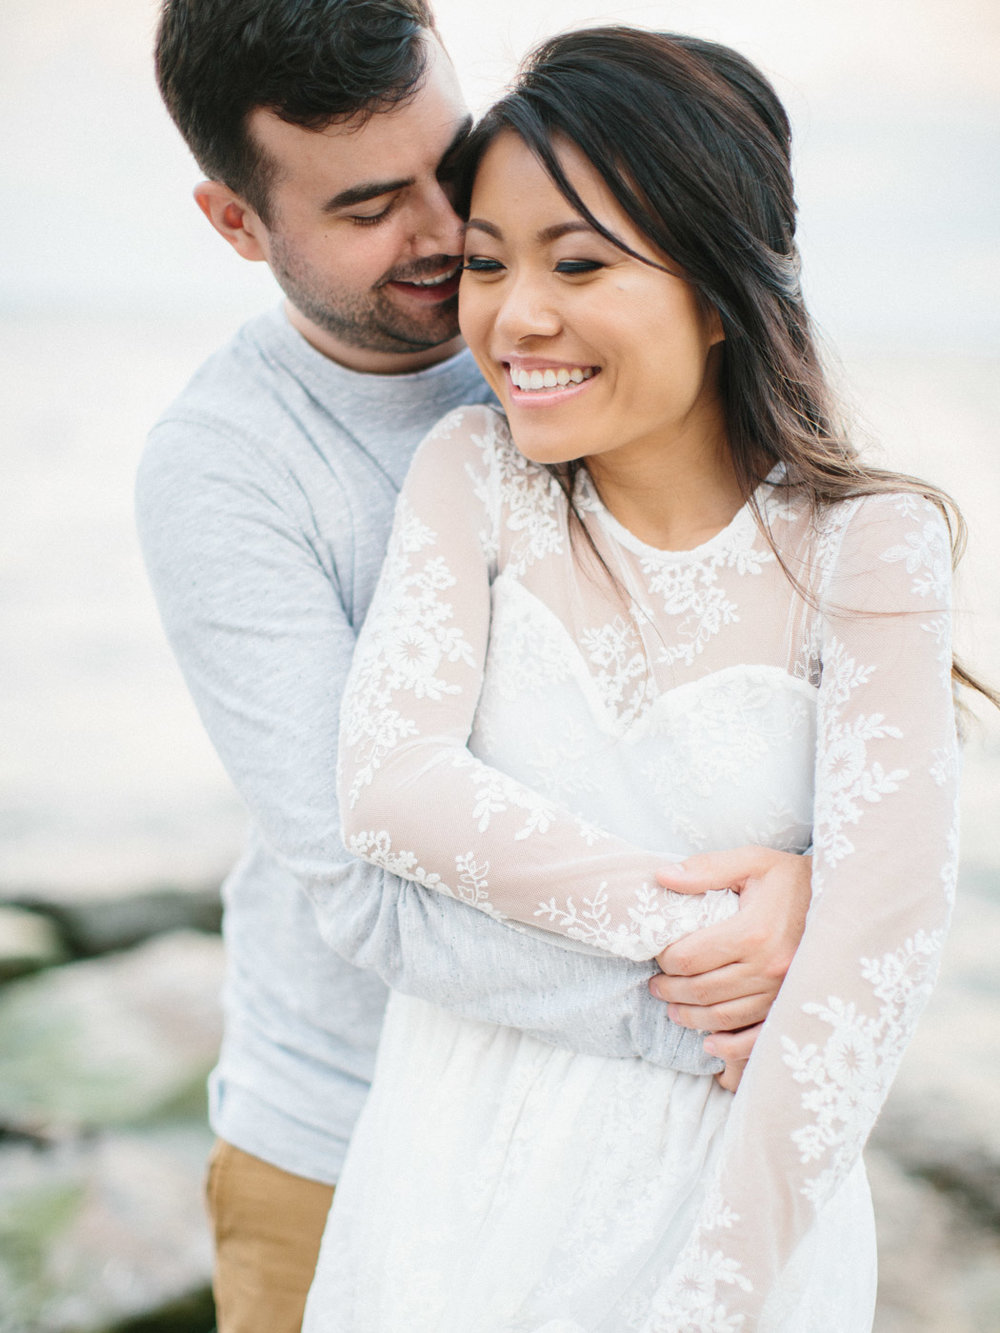 toronto_wedding_photographer_engagement_photography_tips-51.jpg